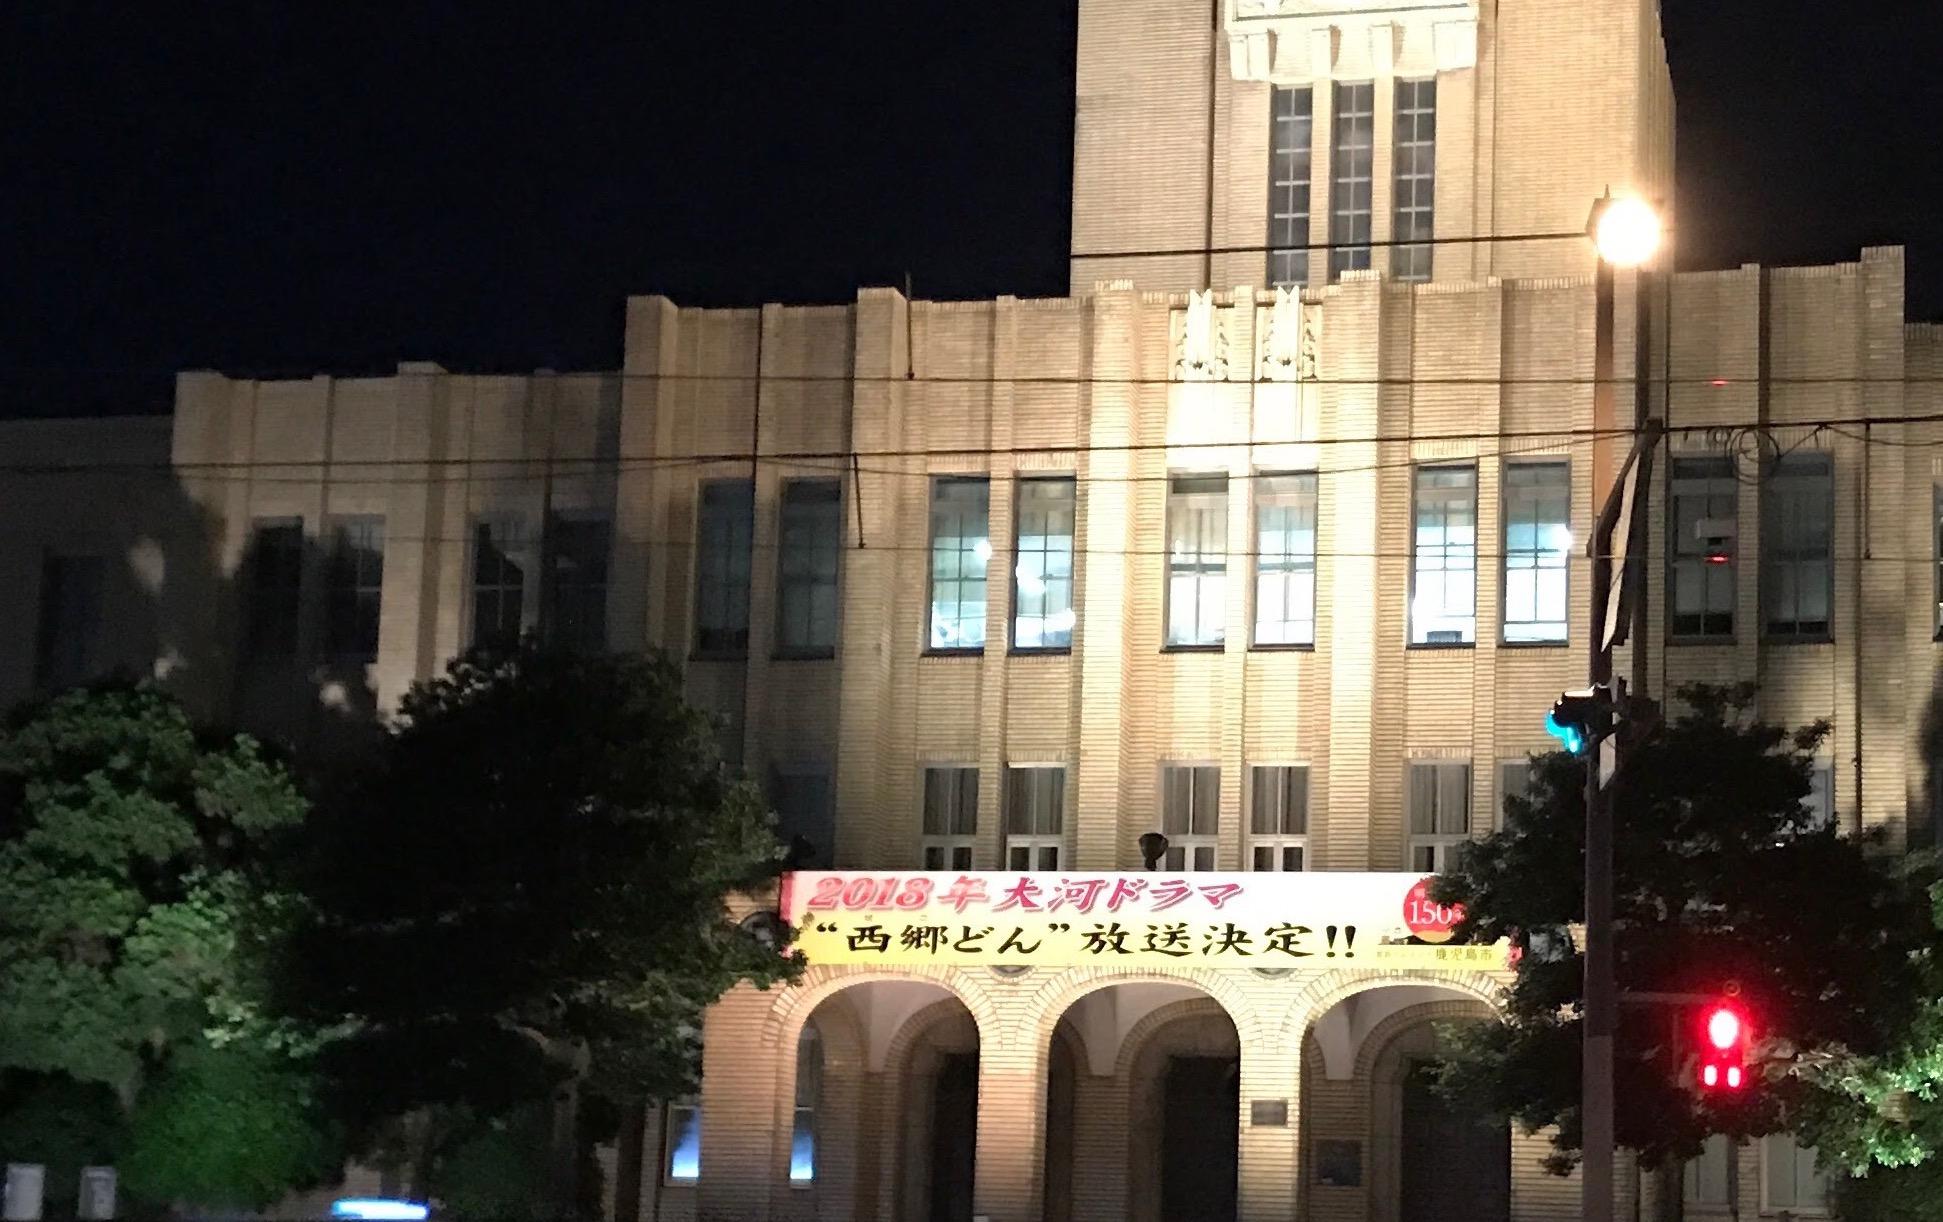 鹿児島市役所の画像